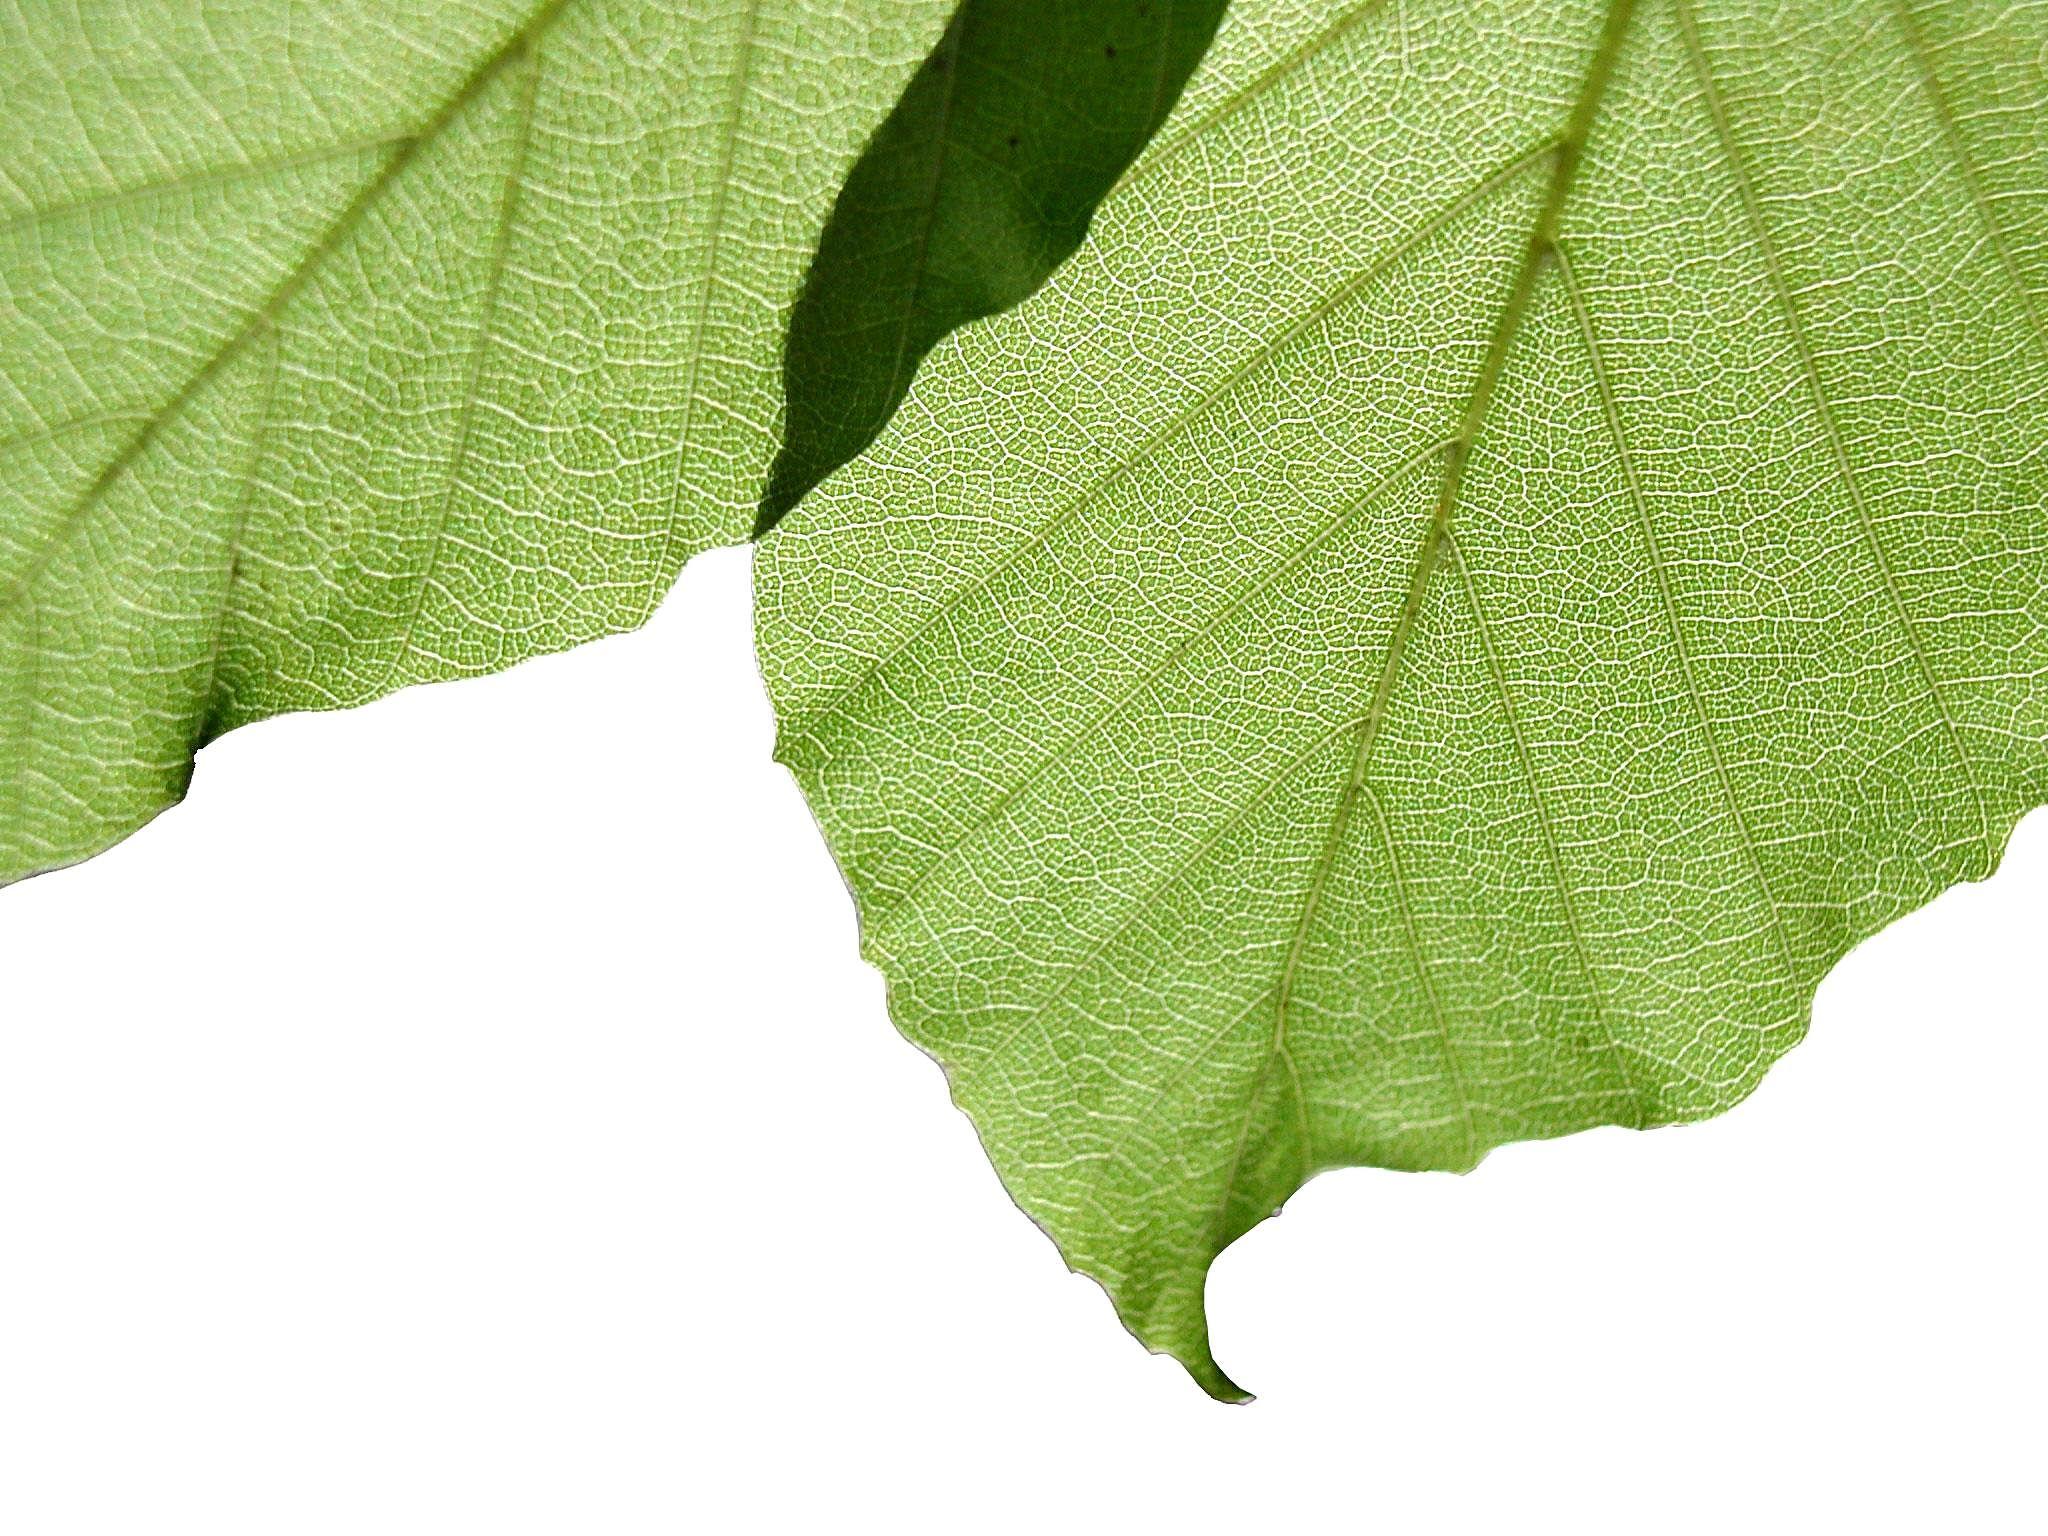 File:Leaves on white background.jpg - Wikimedia Commons